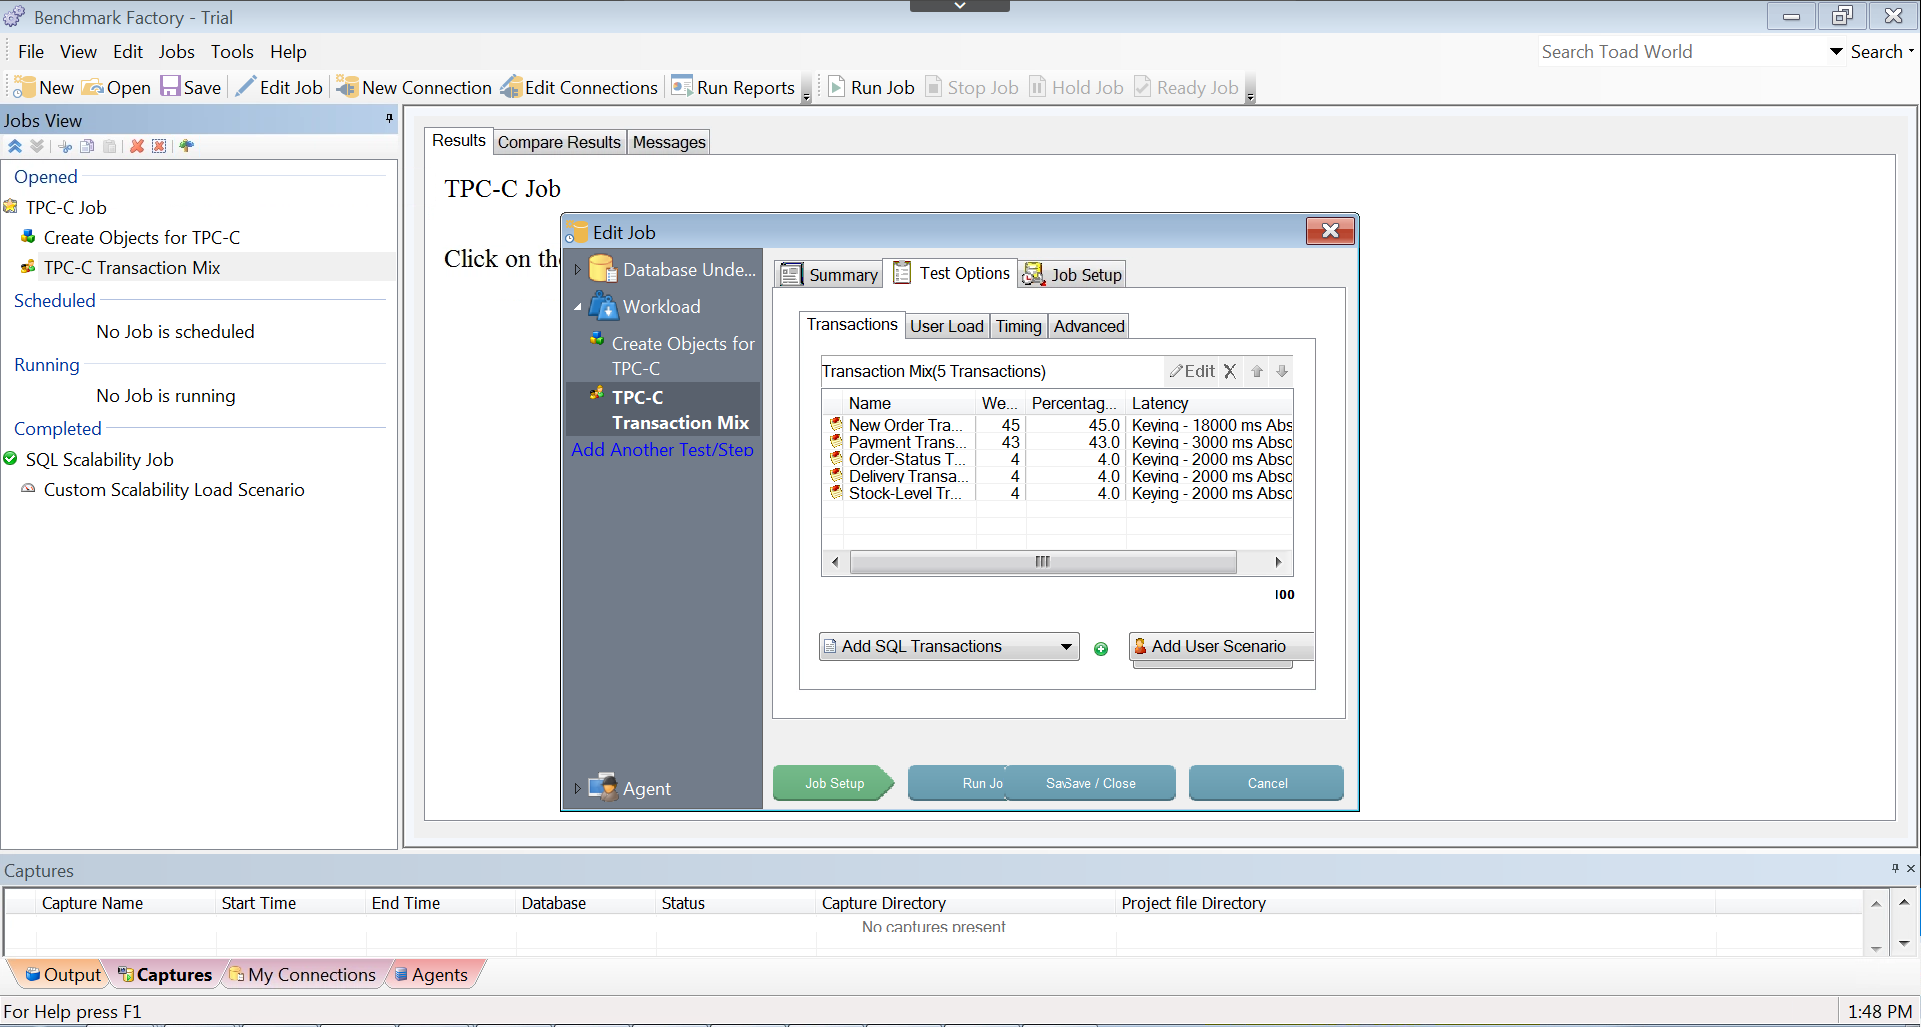 BenchmarkFactory_Simulation